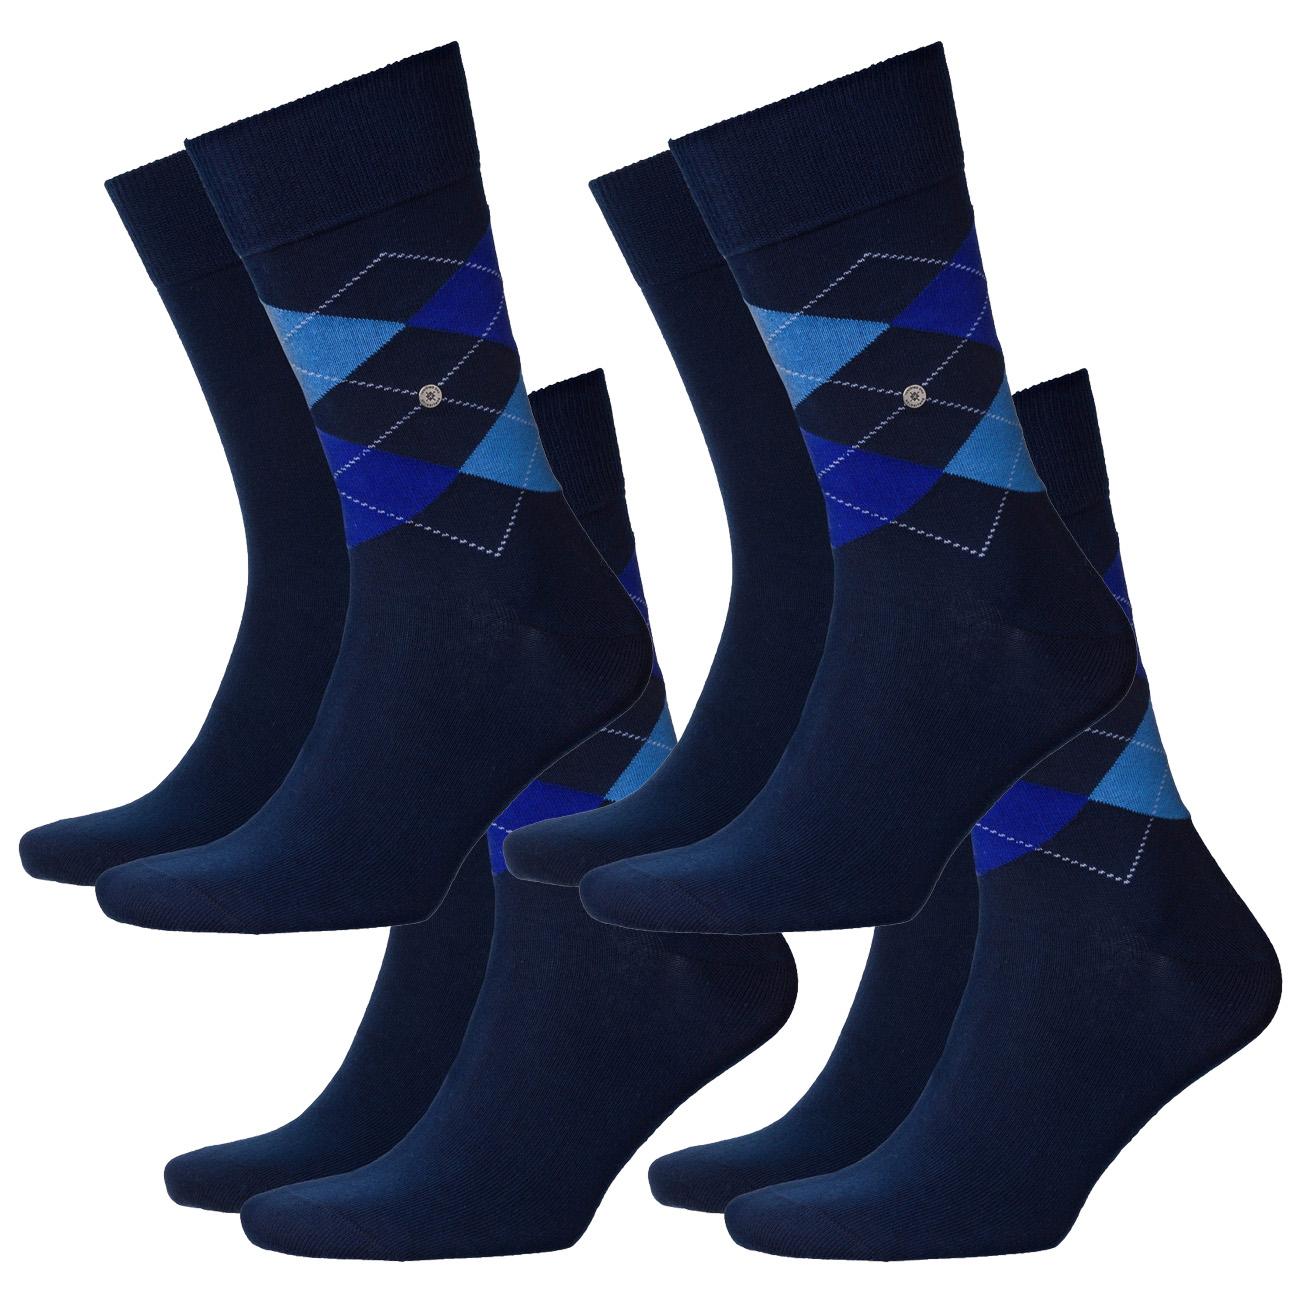 [Amazon] Burlington Herren Socken Everyday Mix 4er Pack (40/46) Marine oder Anthracite Melange